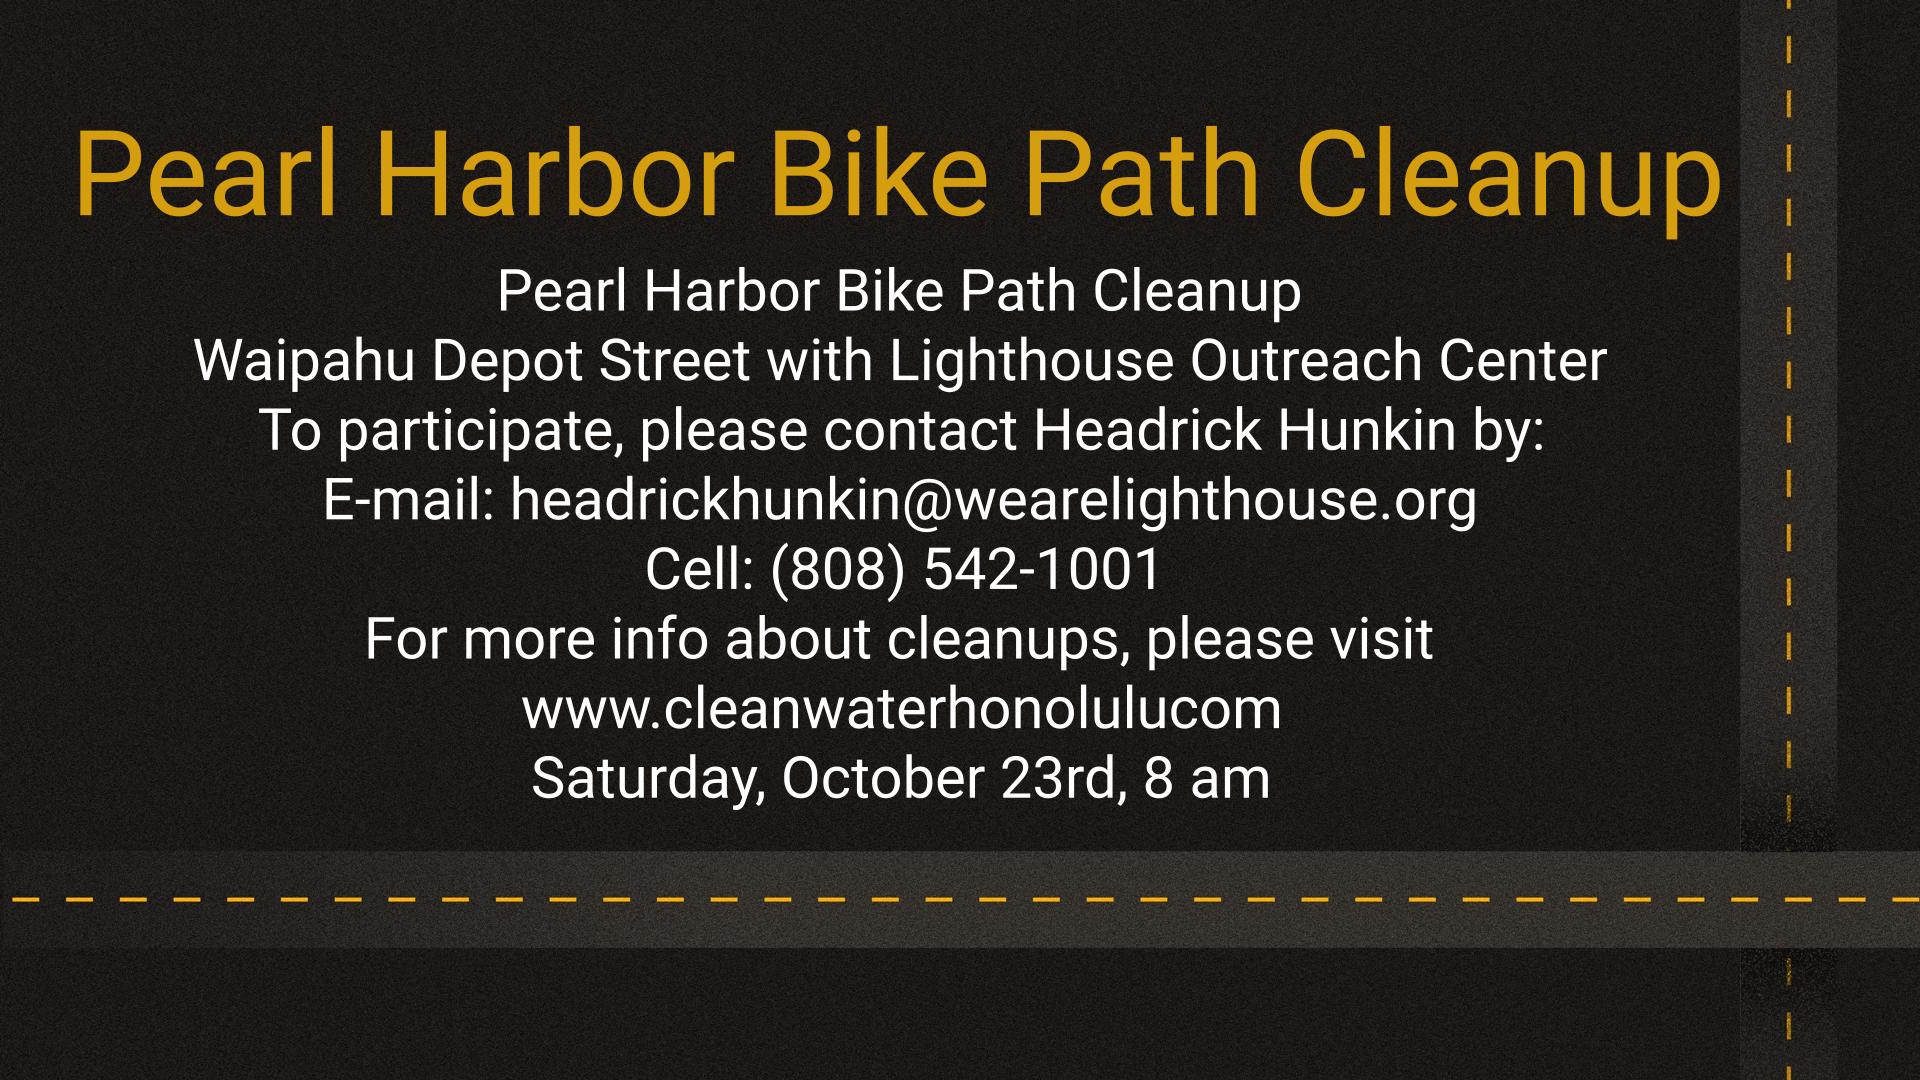 Pearl Harbor Bike Path Cleanup